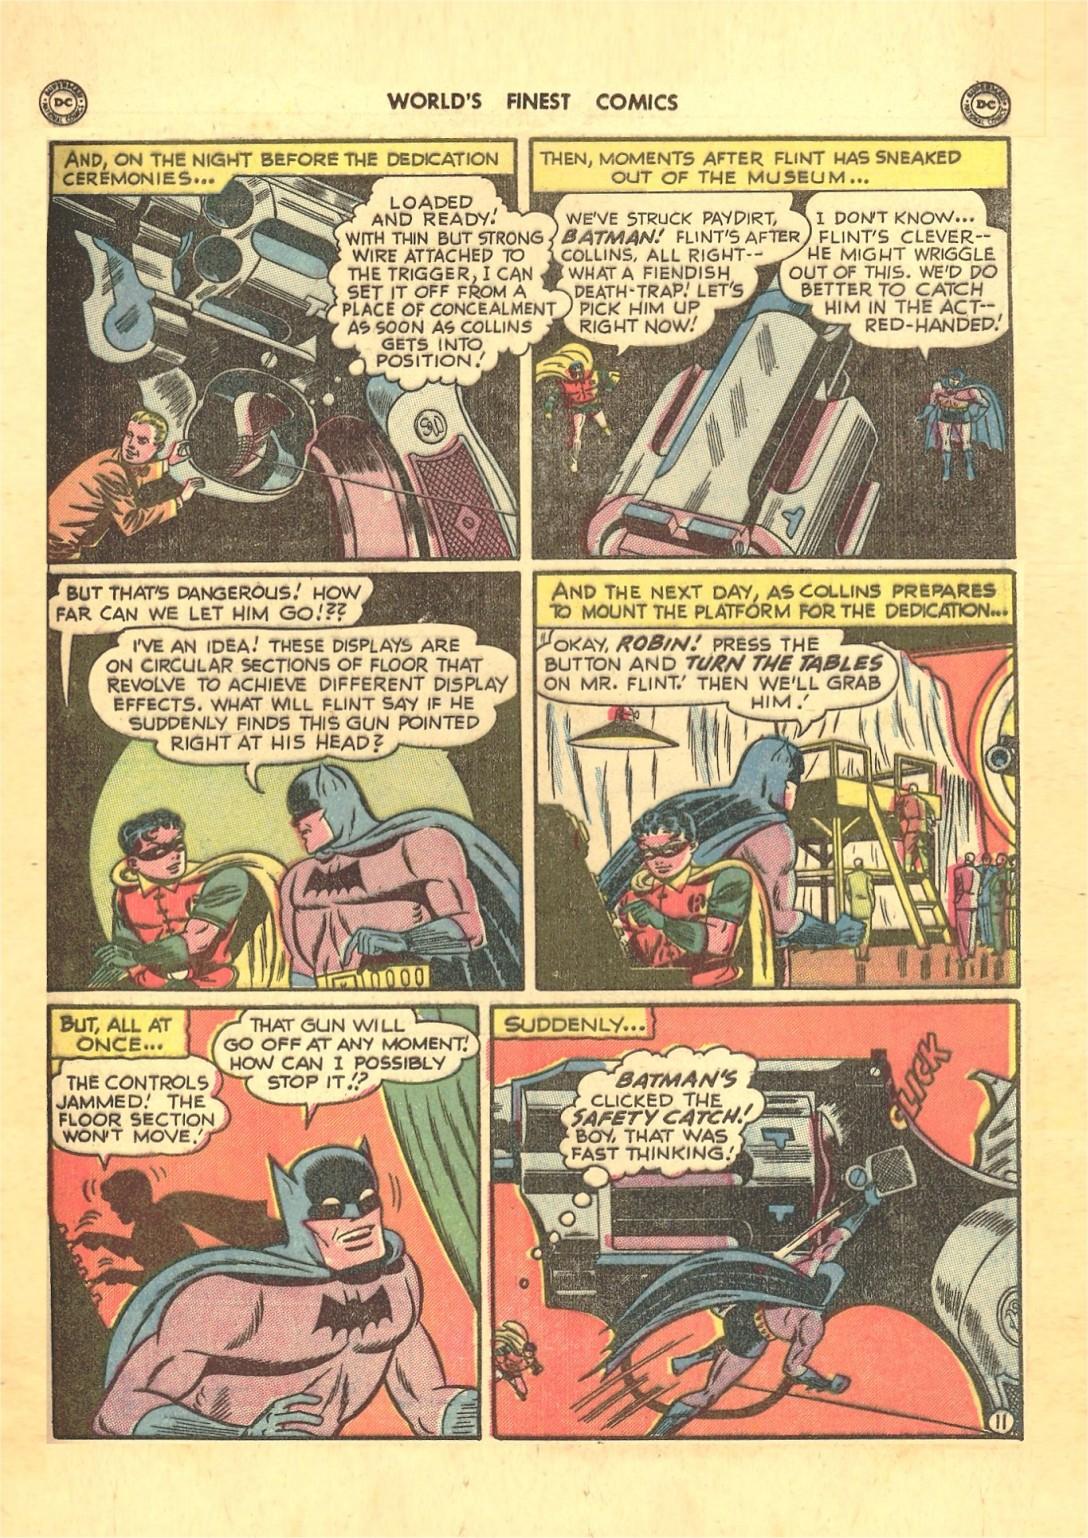 Read online World's Finest Comics comic -  Issue #50 - 73